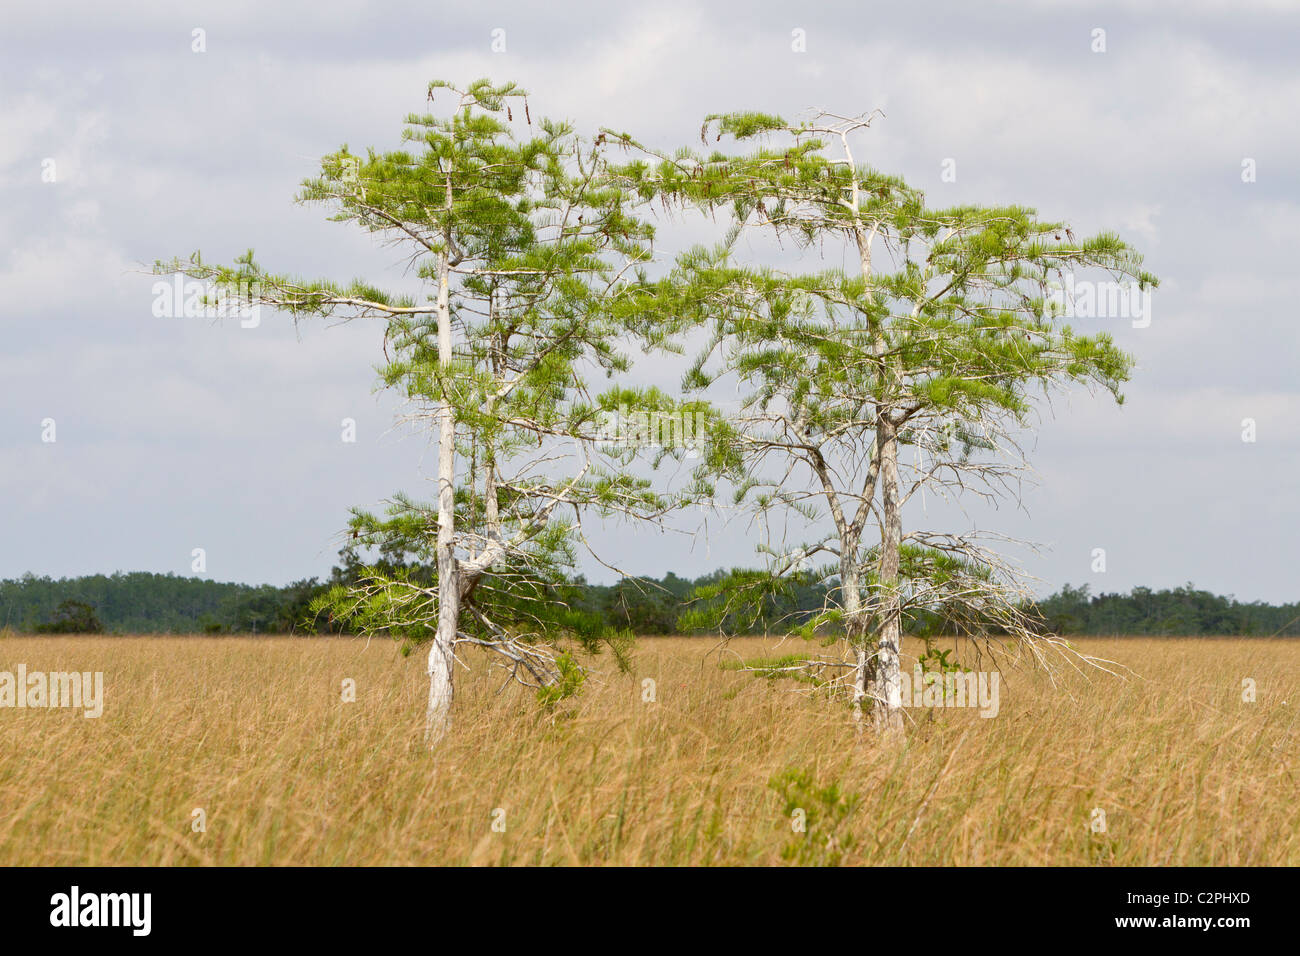 Everglades, Florida. Sawgrass habitat with young bald cypress trees - Stock Image